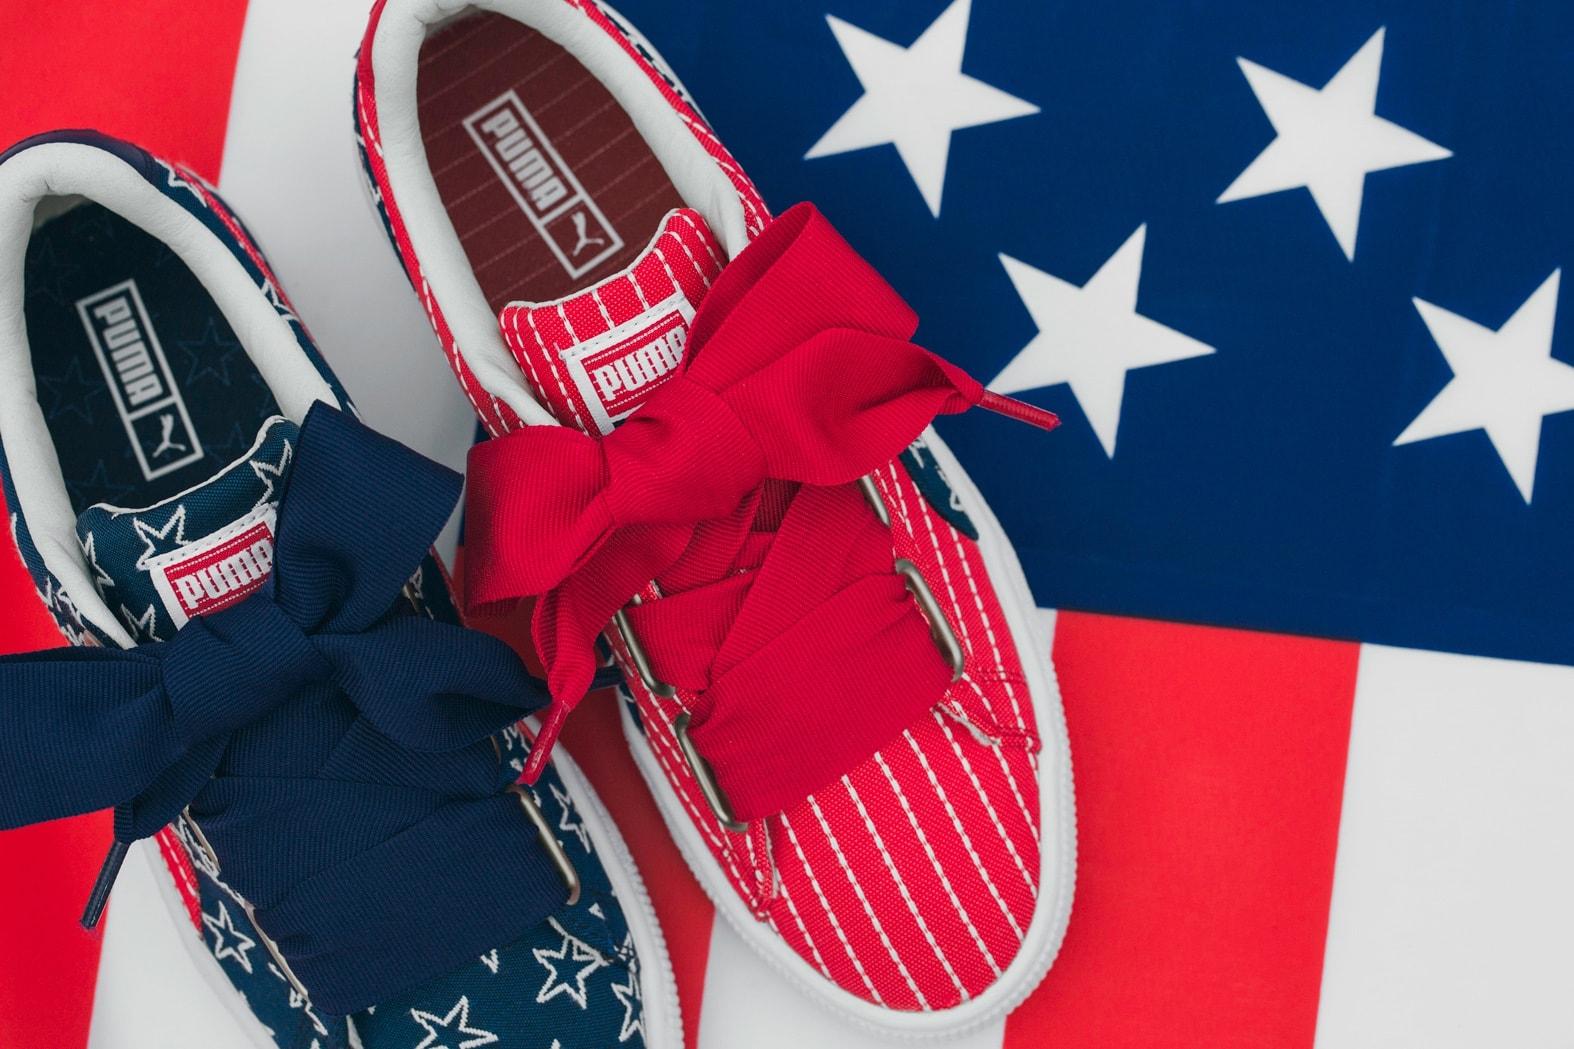 Sneaker Releases 2017 June KKW Beauty Kim Kardashian PUMA Basket Heart adidas Yeezy Zebra Pigalle NikeLab